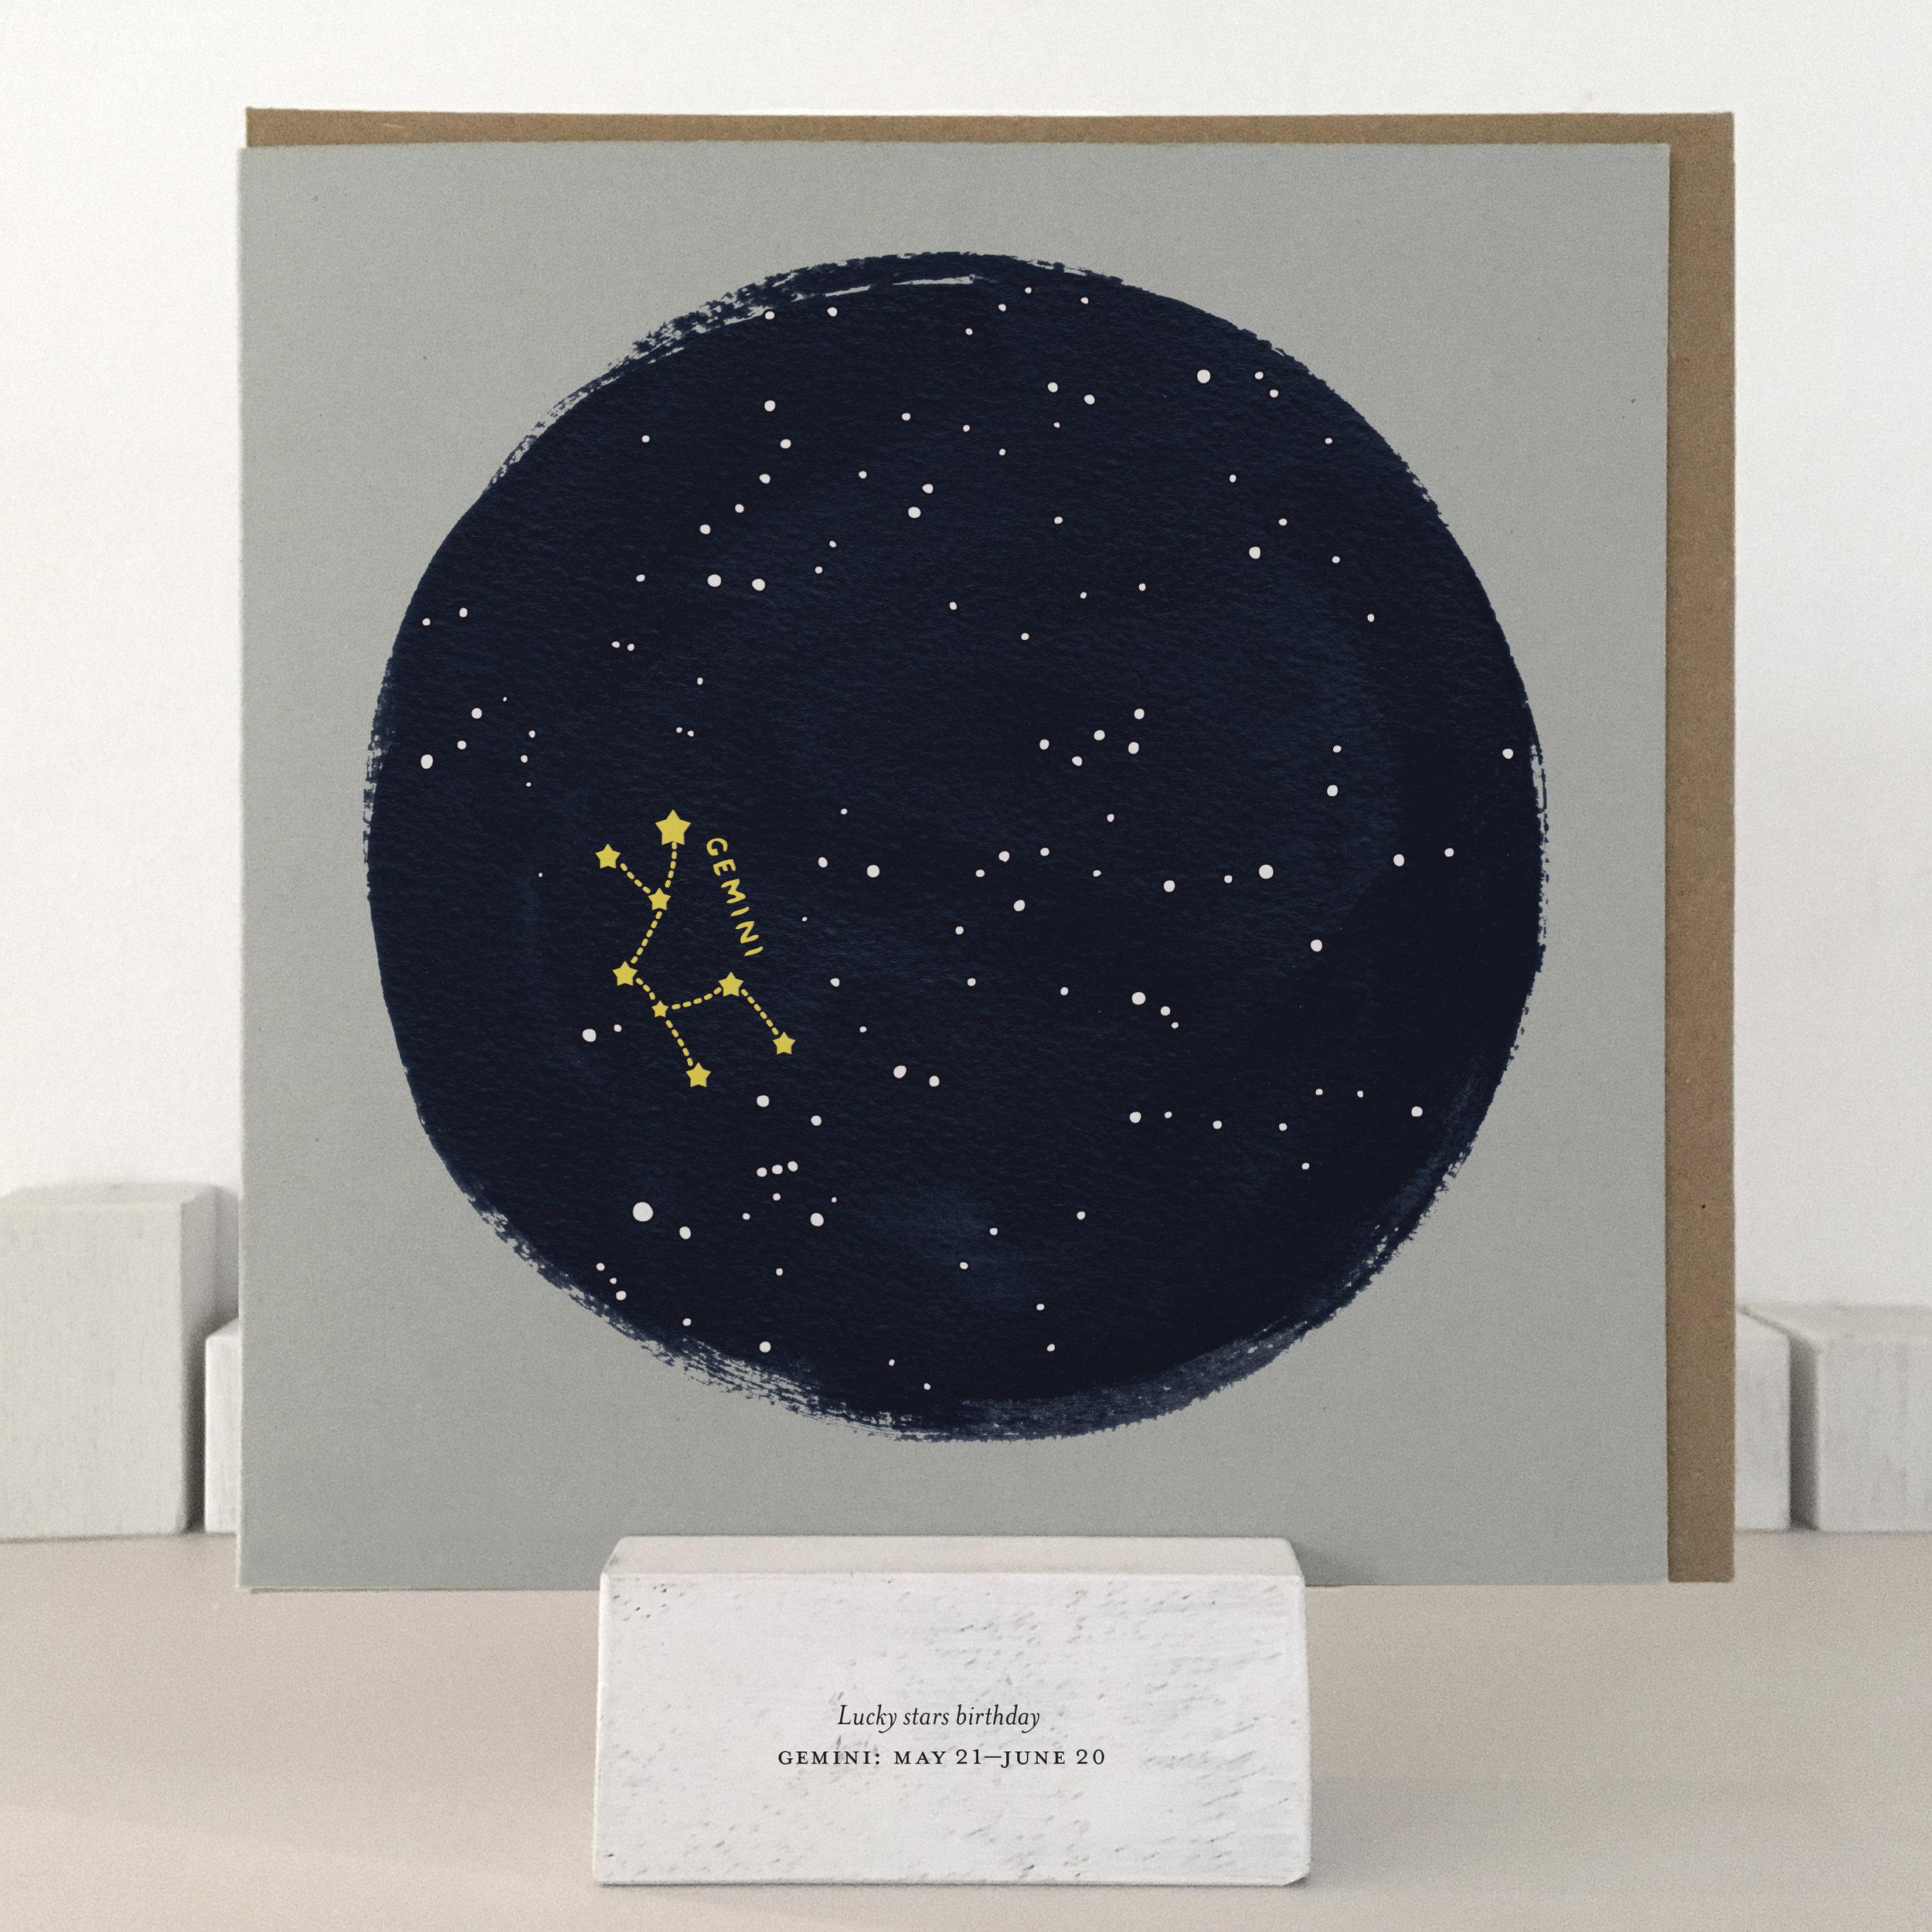 Gemini birthday card: XLSB03_gemini